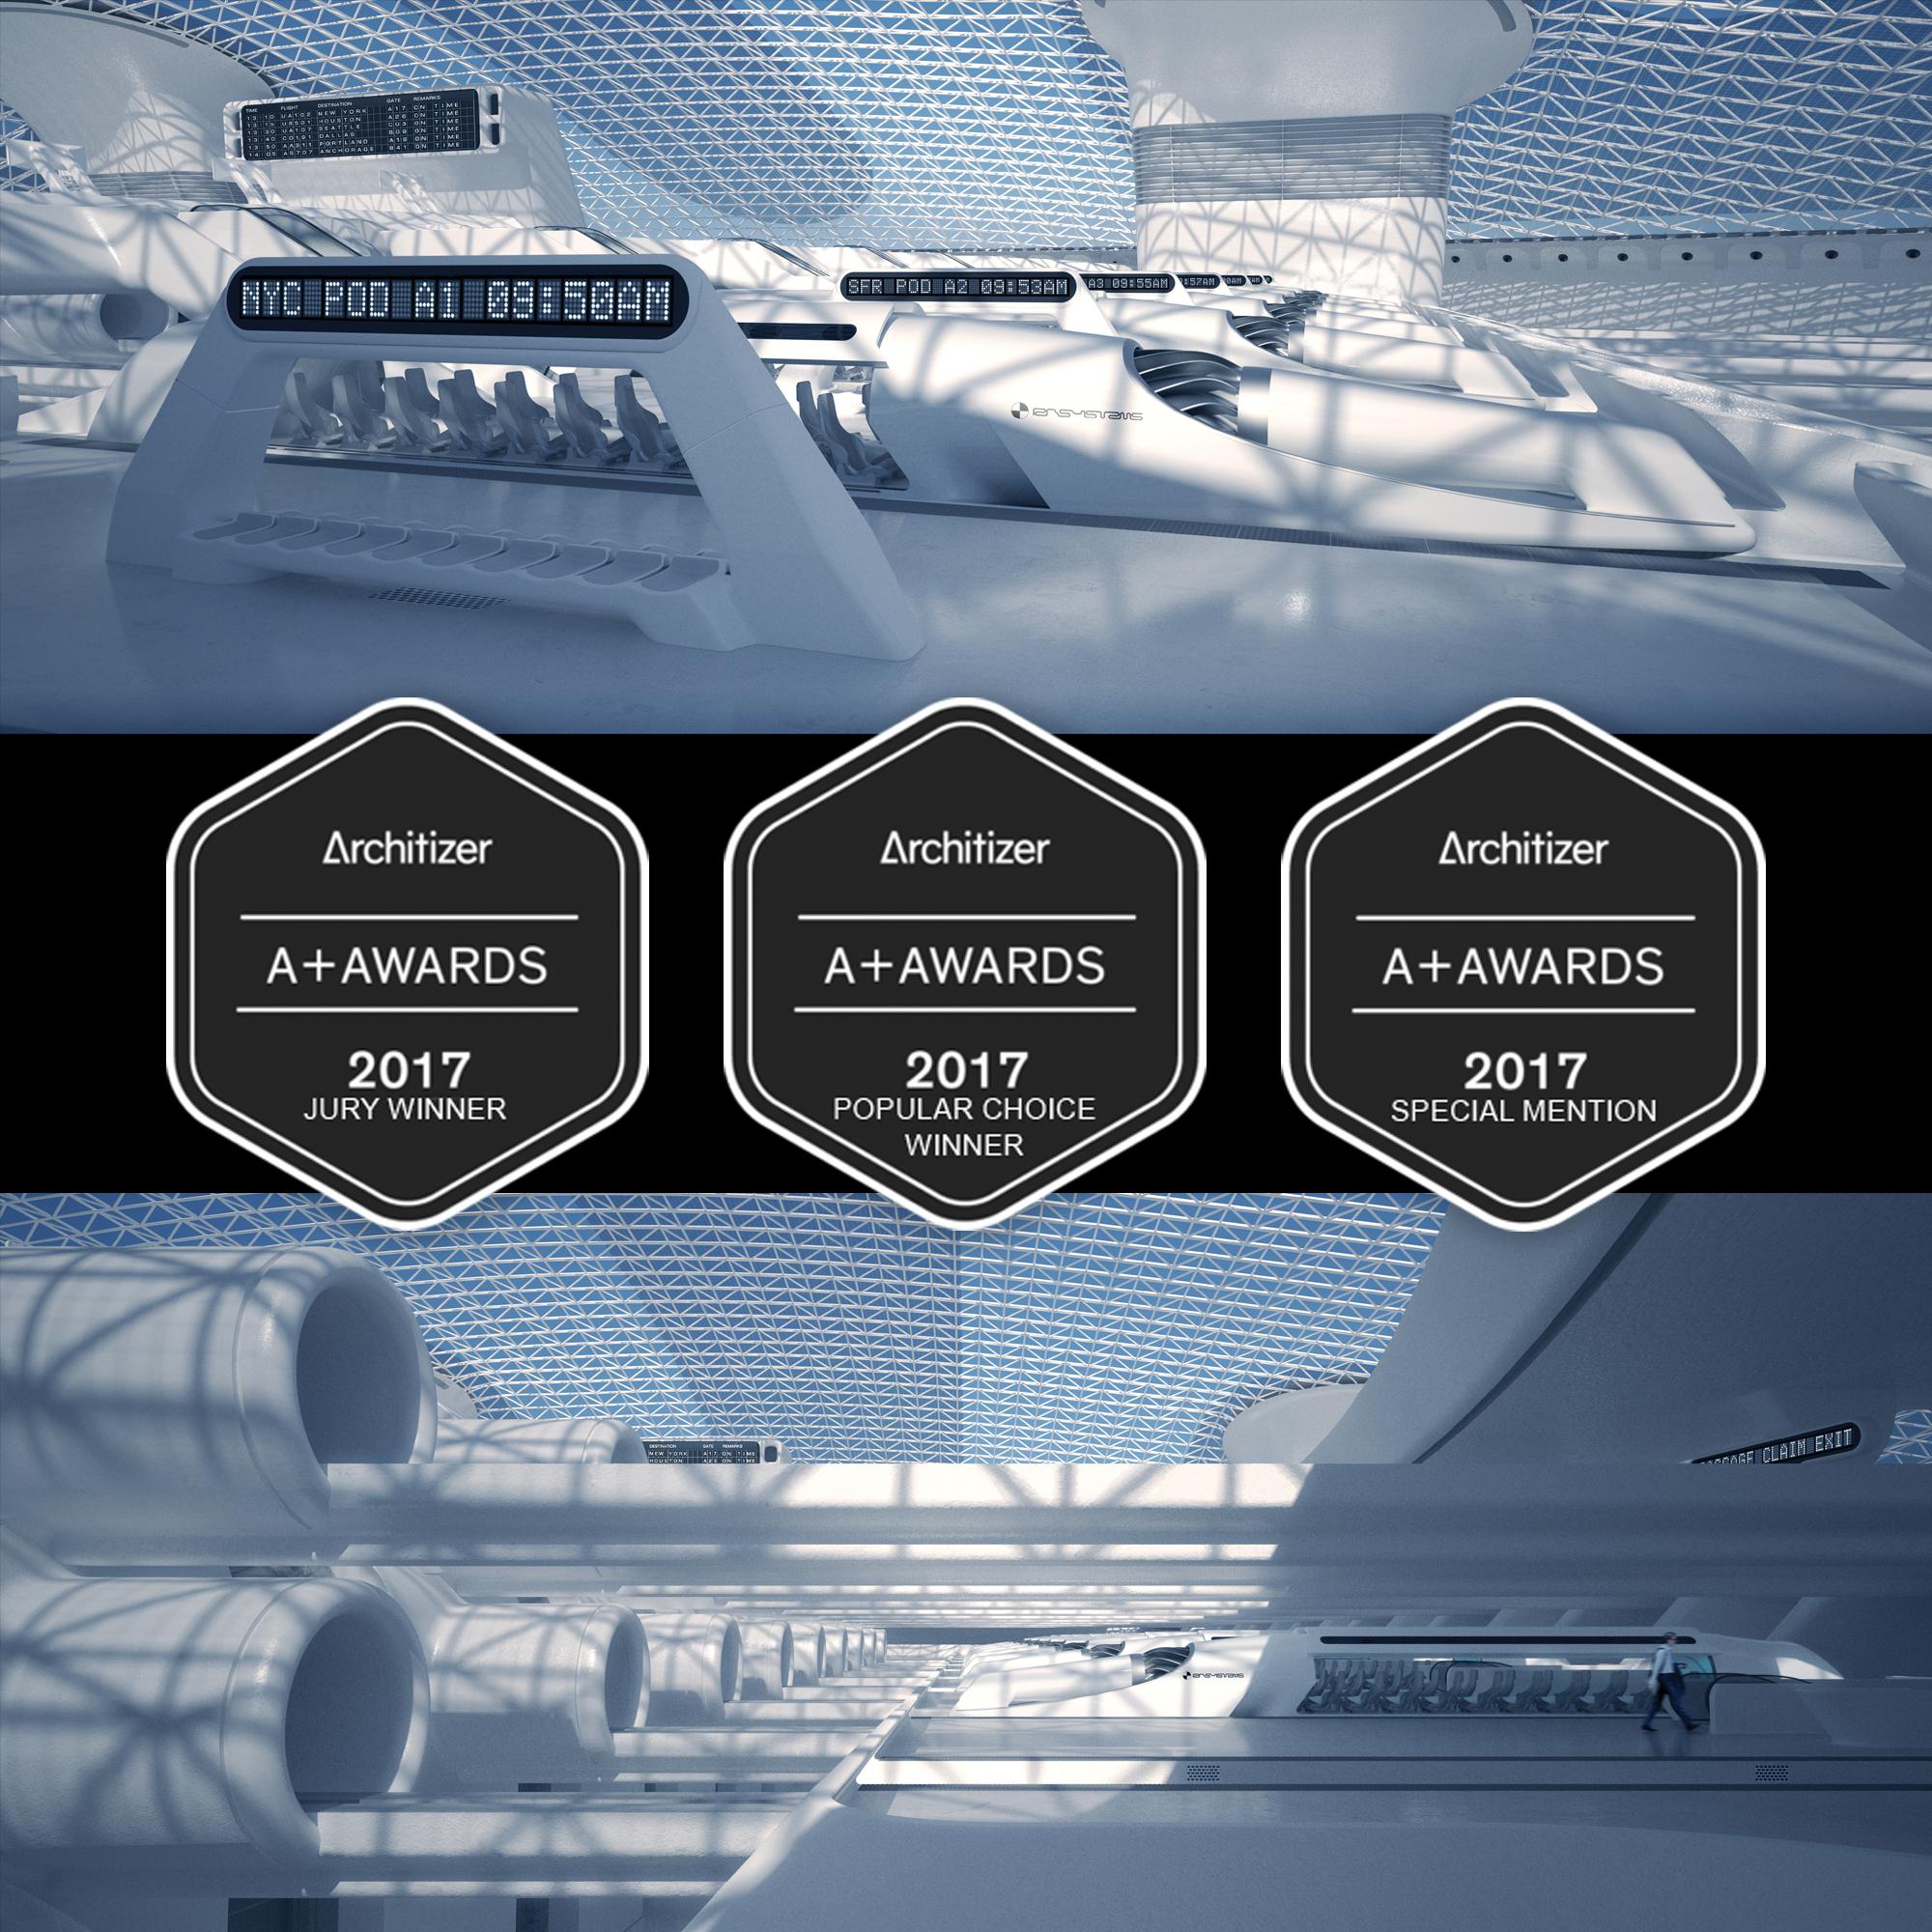 Hyperloop_RB Systems_ArchitizerA+Award_Rustem Baishev.jpg